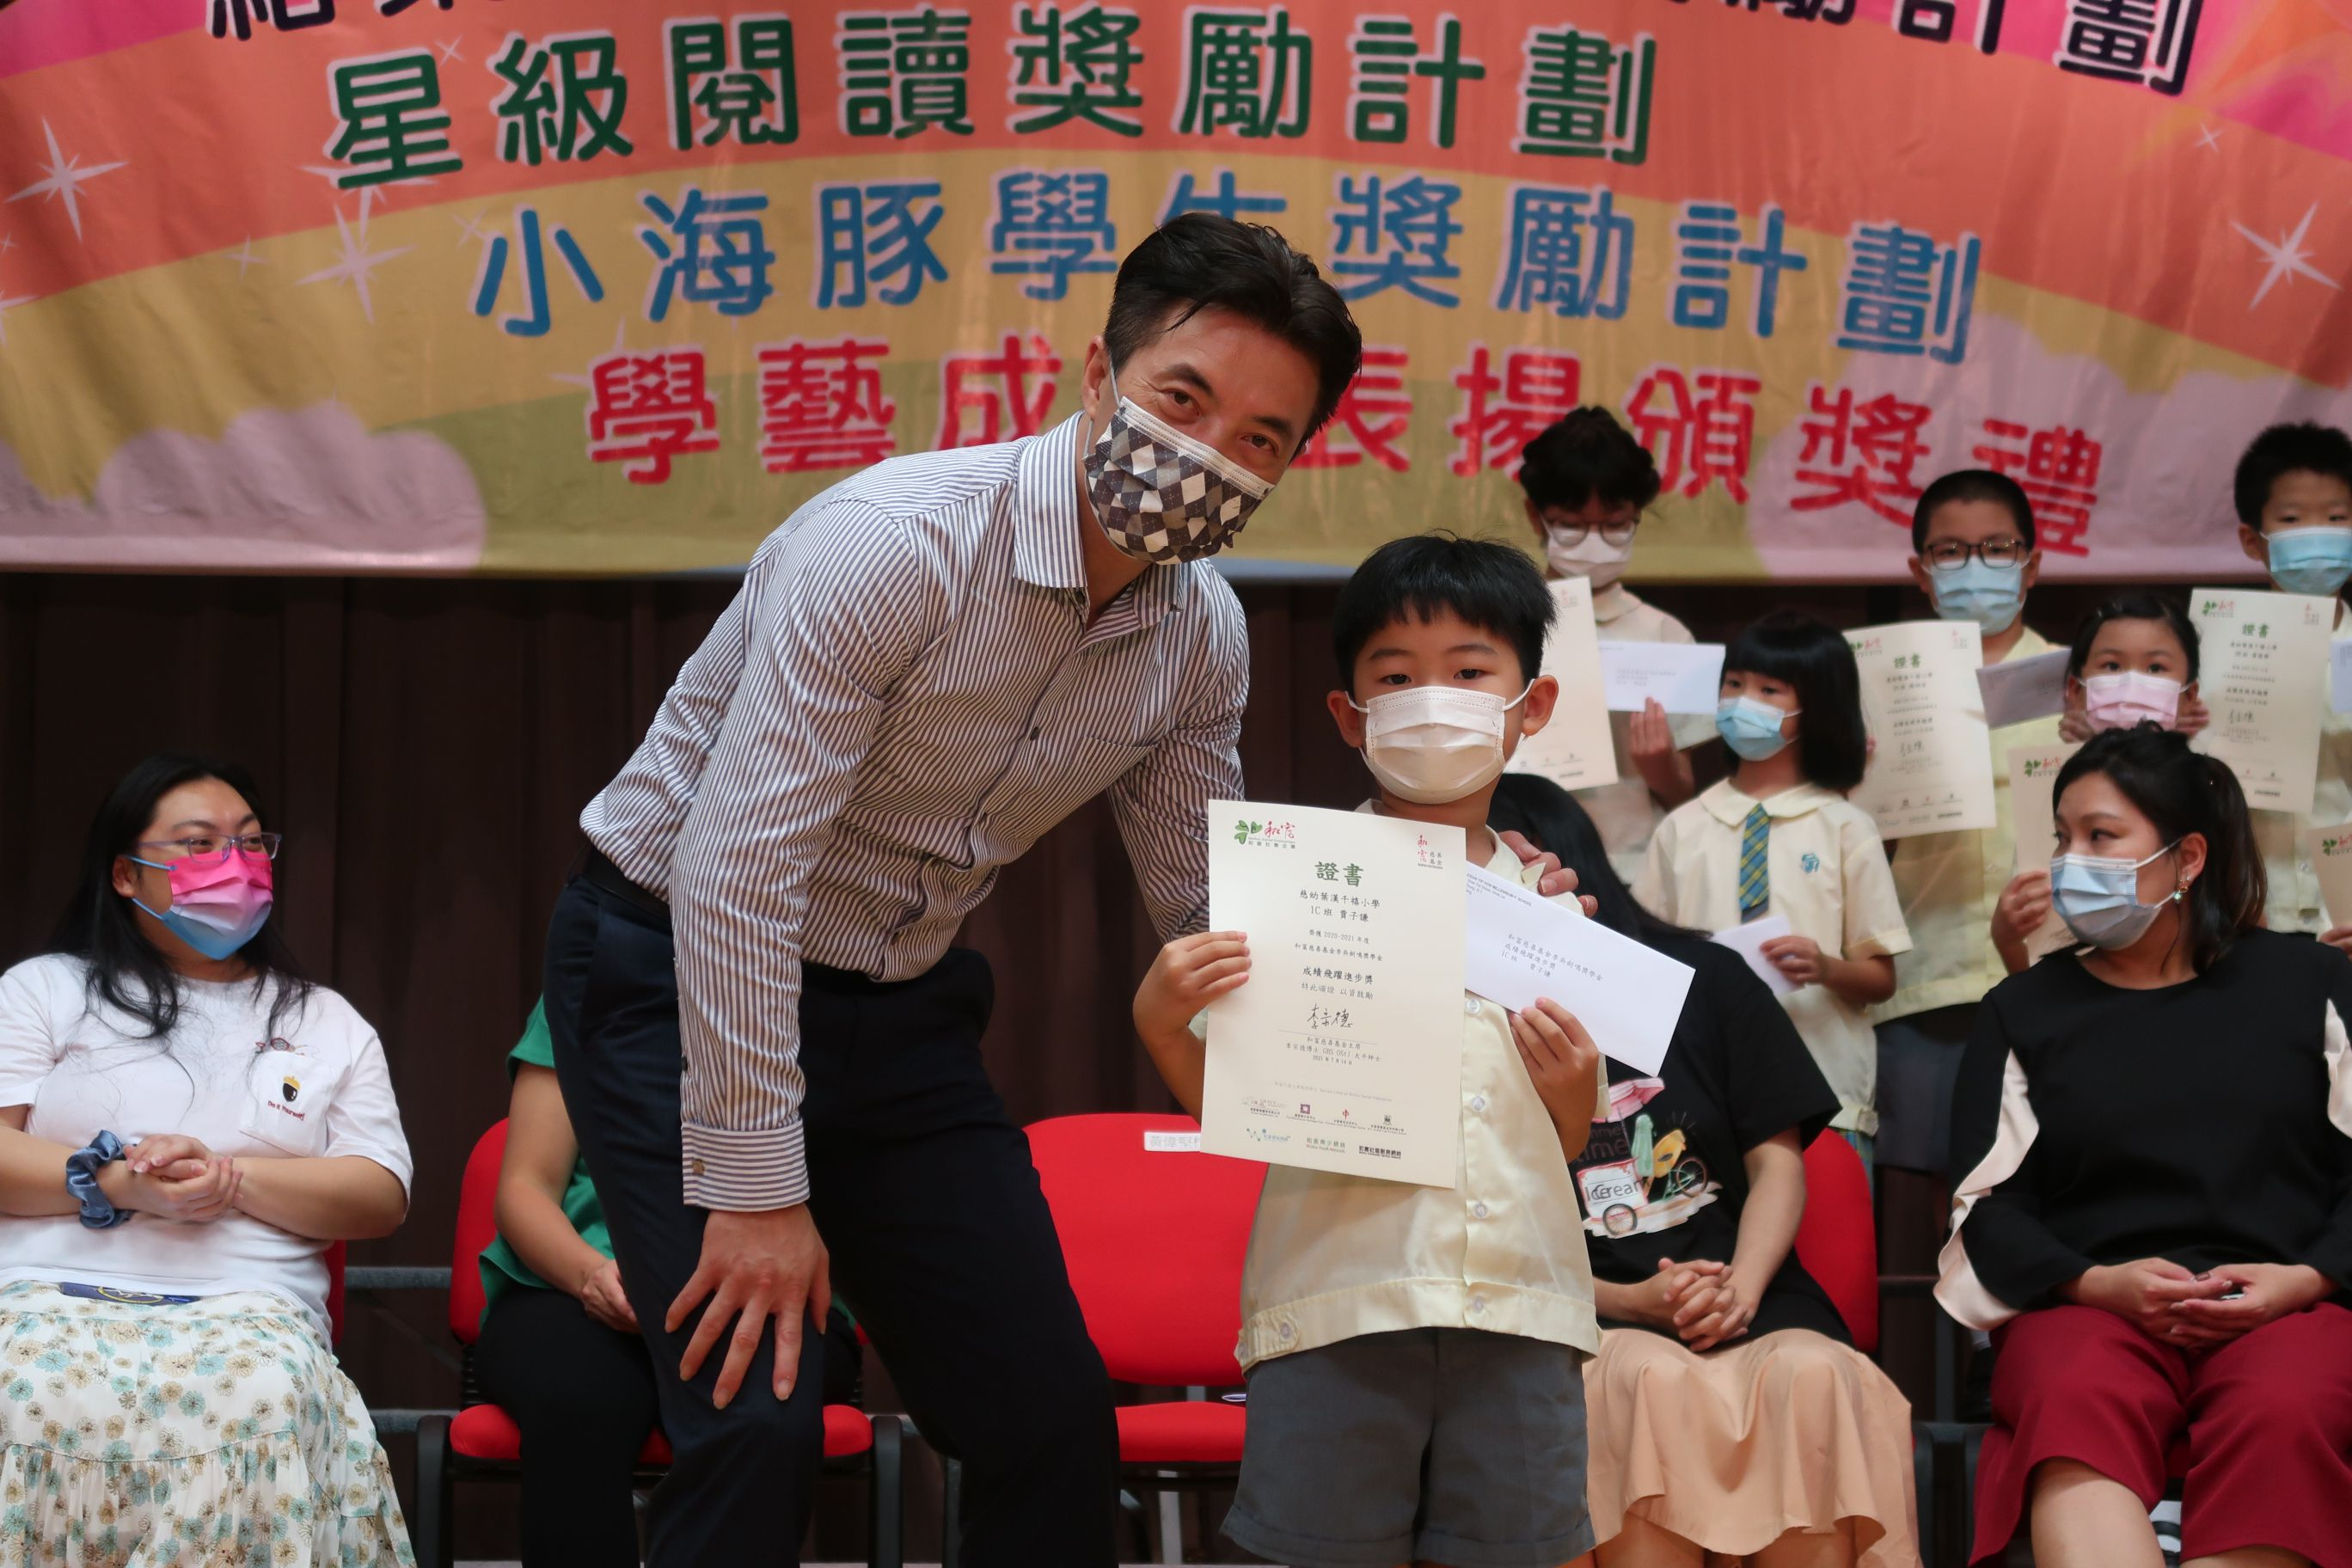 https://syh.edu.hk/sites/default/files/img_5937_1.jpg